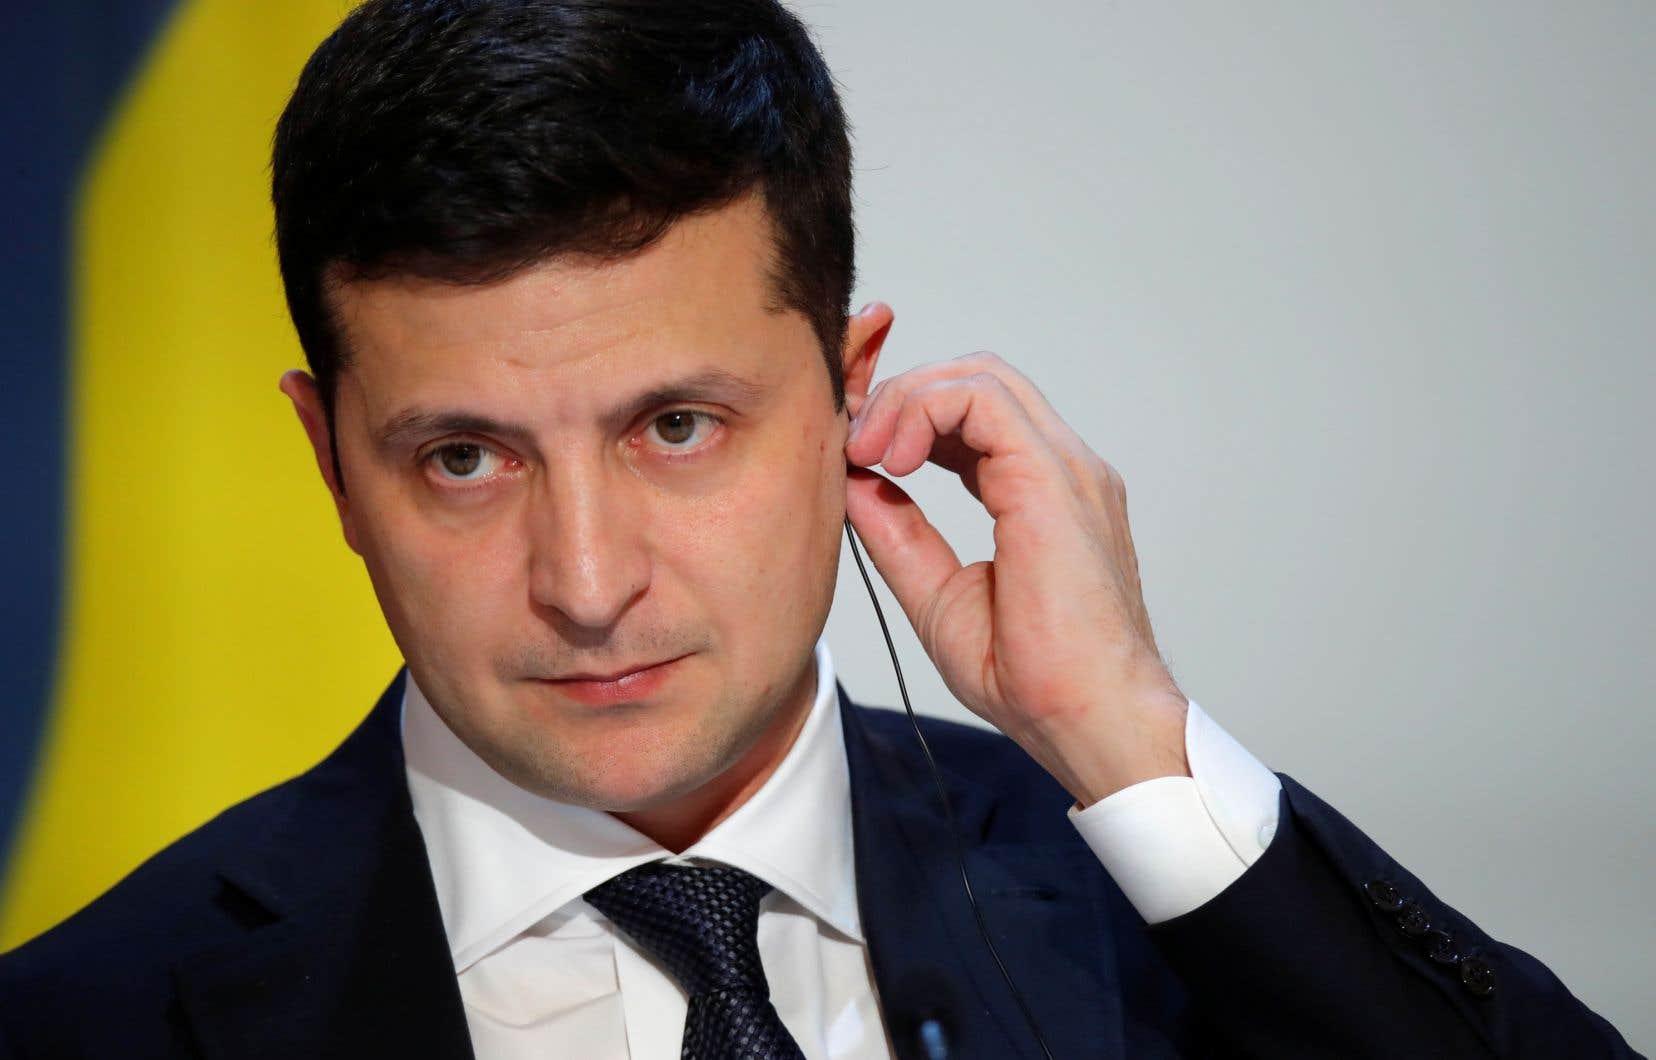 Le président de l'Ukraine, Volodymyr Zelensky